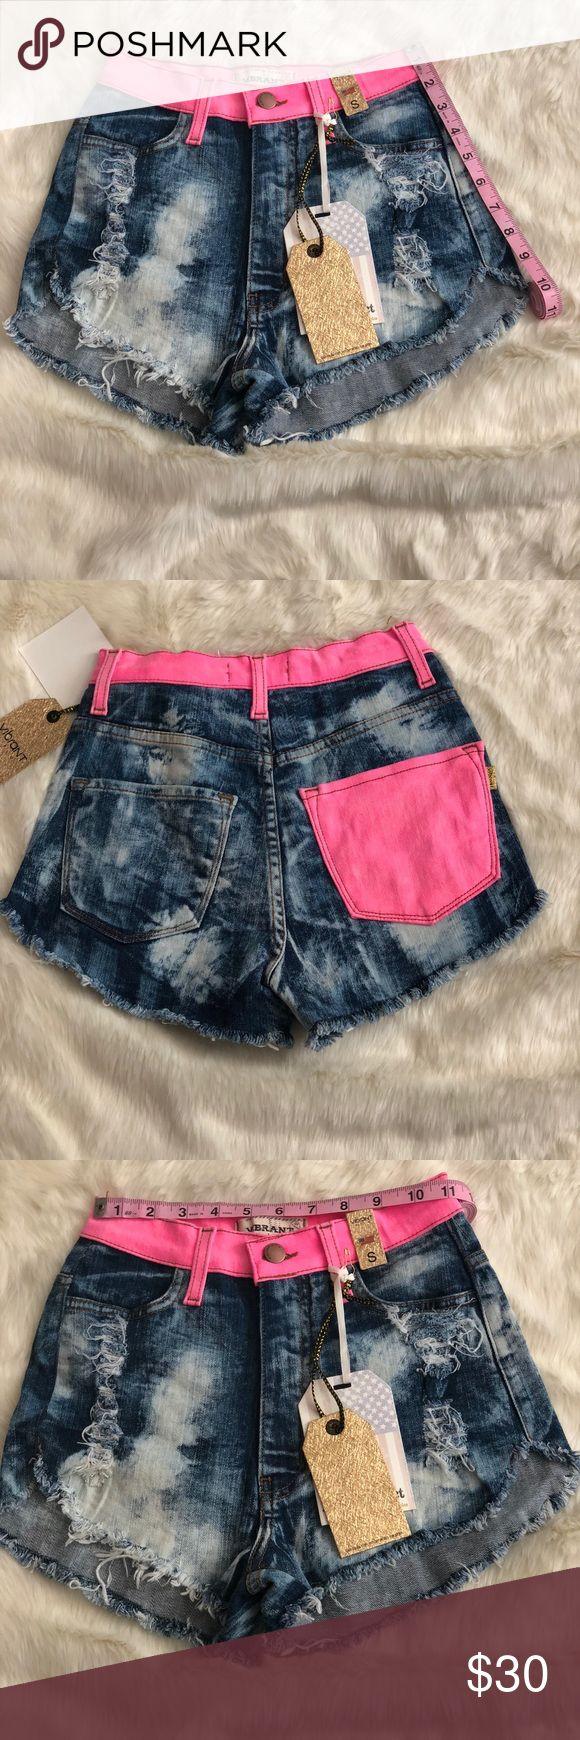 🎉3 cut offs acid wash shorts🎉 Three acid wash cut offs in different fun and vibrant summer colors. vibrant M.I.U Shorts Jean Shorts